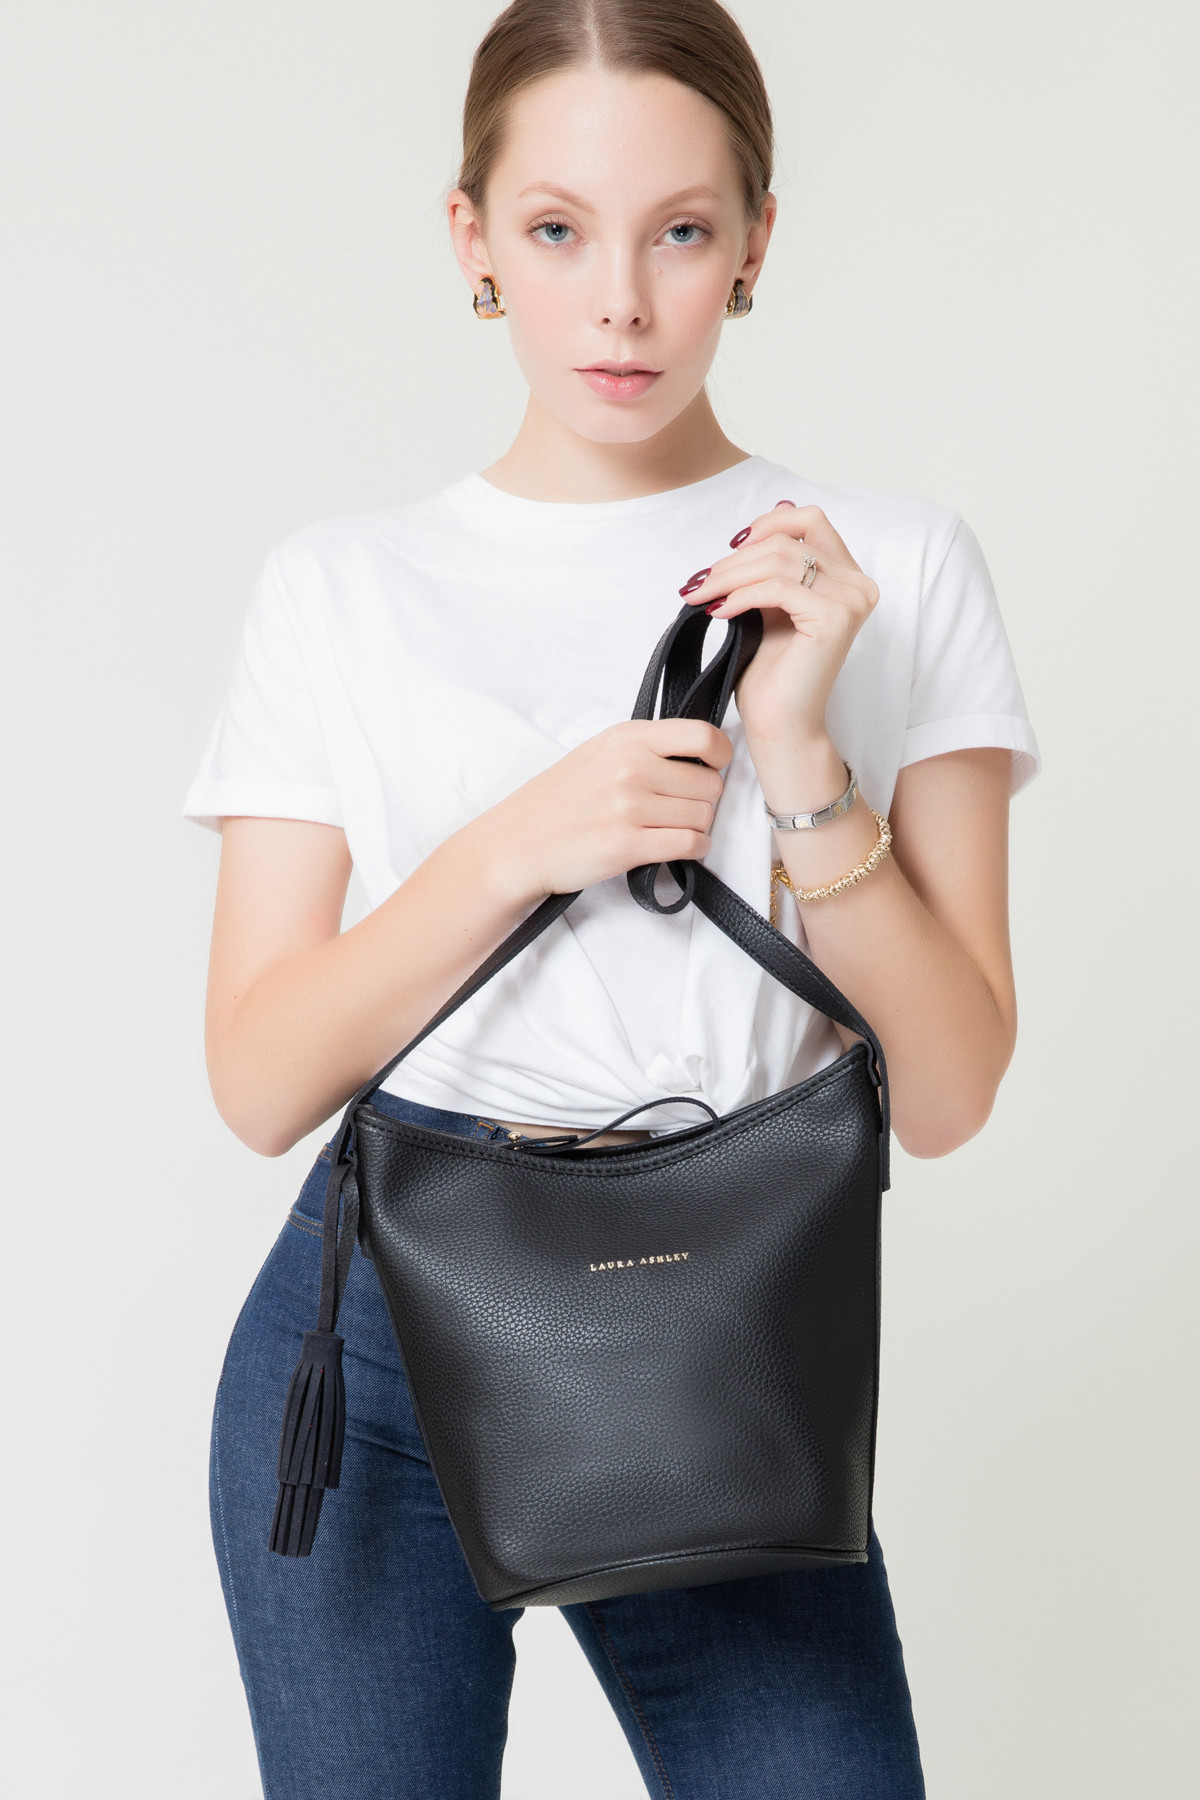 Laura Ashley Kadın Püsküllü Çanta Siyah 2